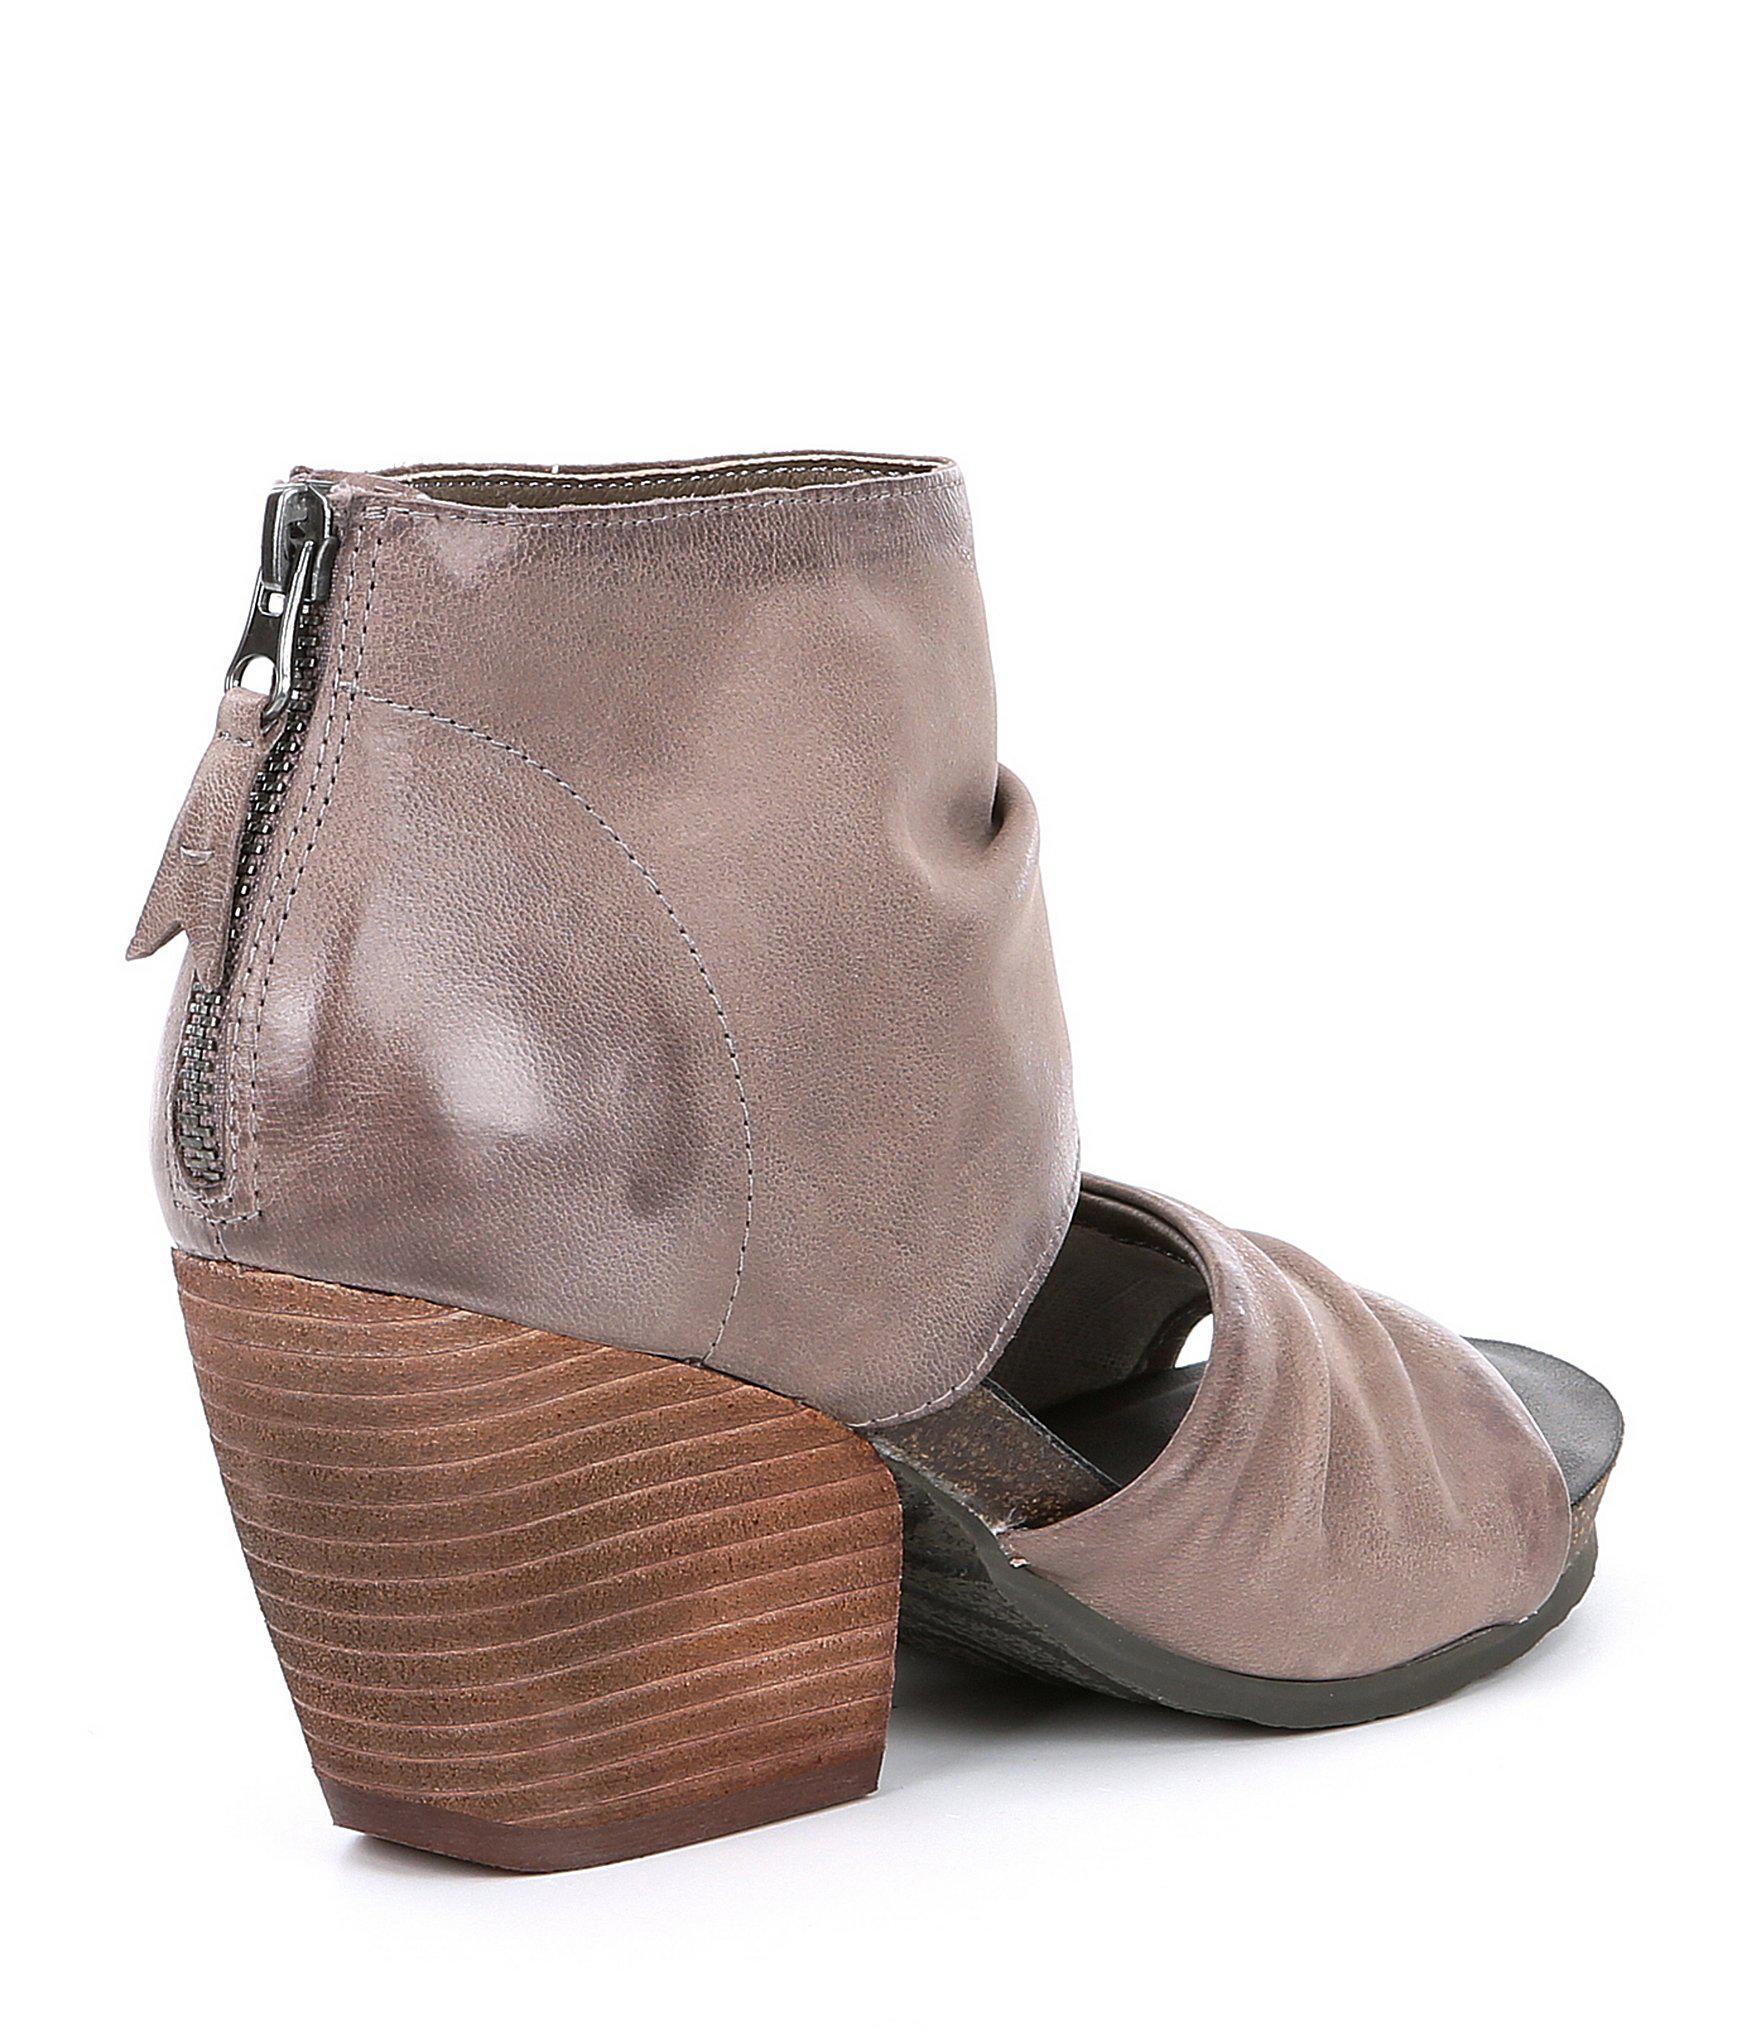 877c728f1c1 Lyst - Otbt Patchouli Leather Sandals in Brown